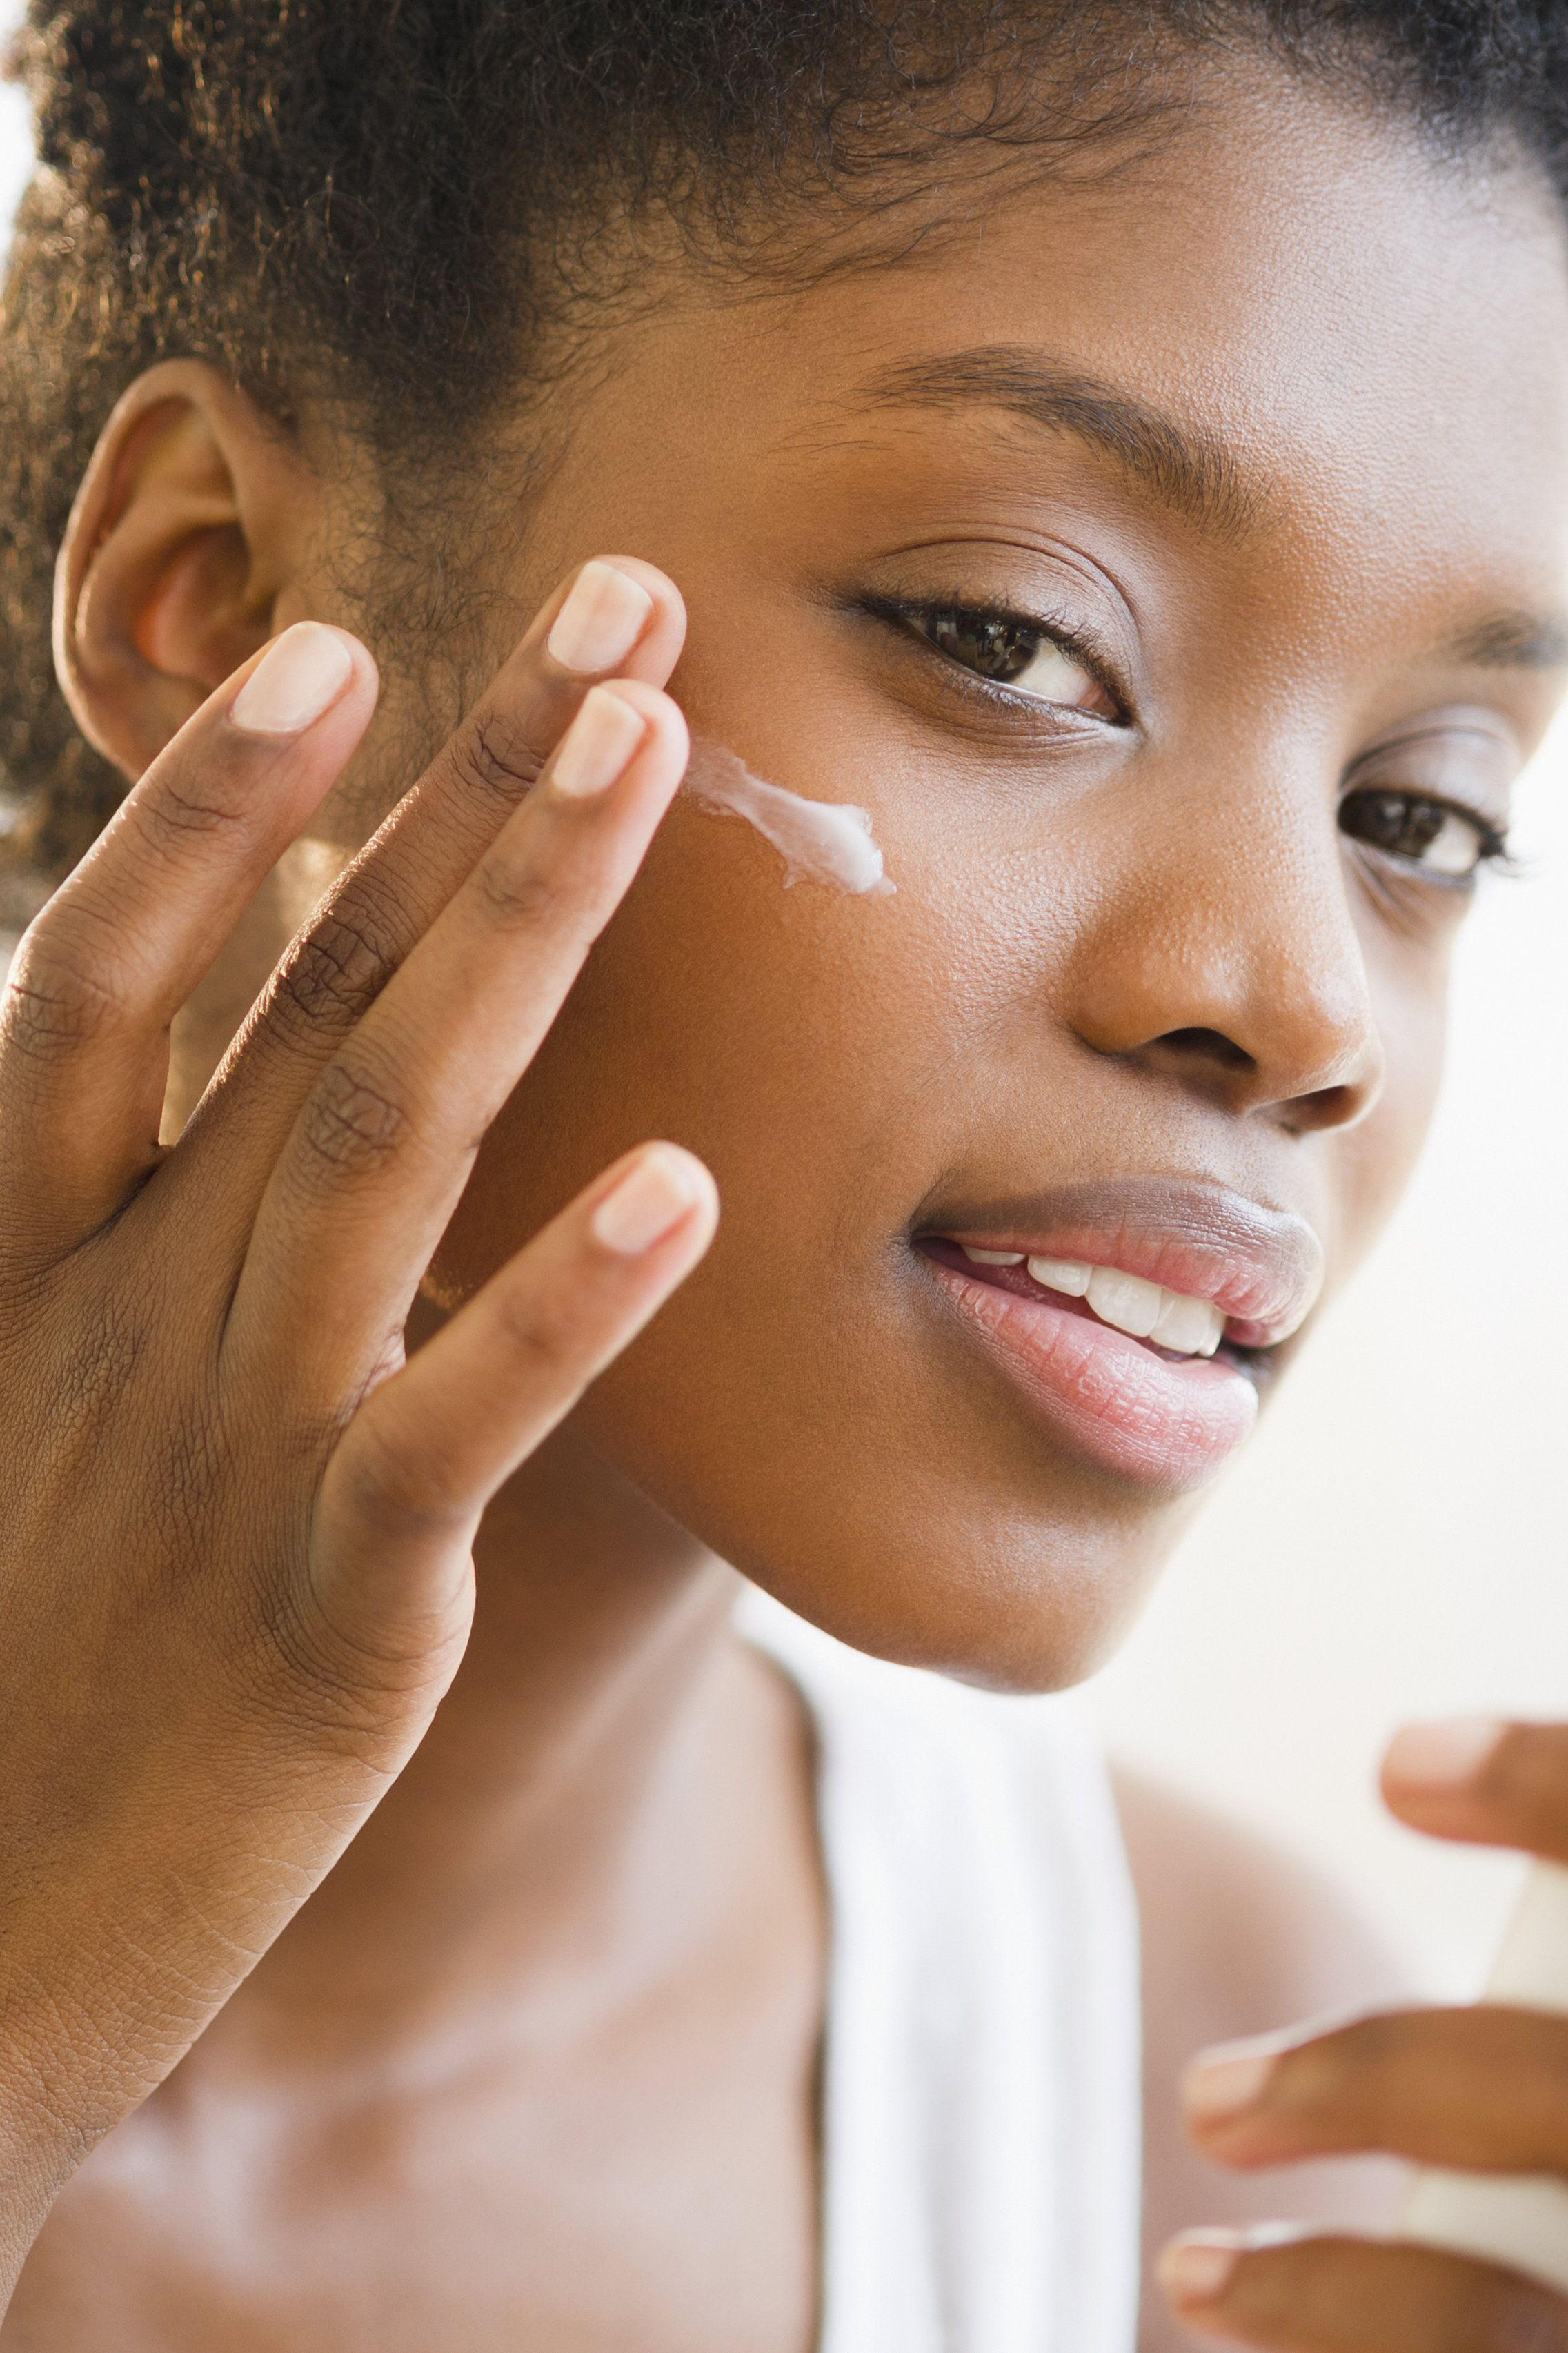 Smooth skin: myth or reality